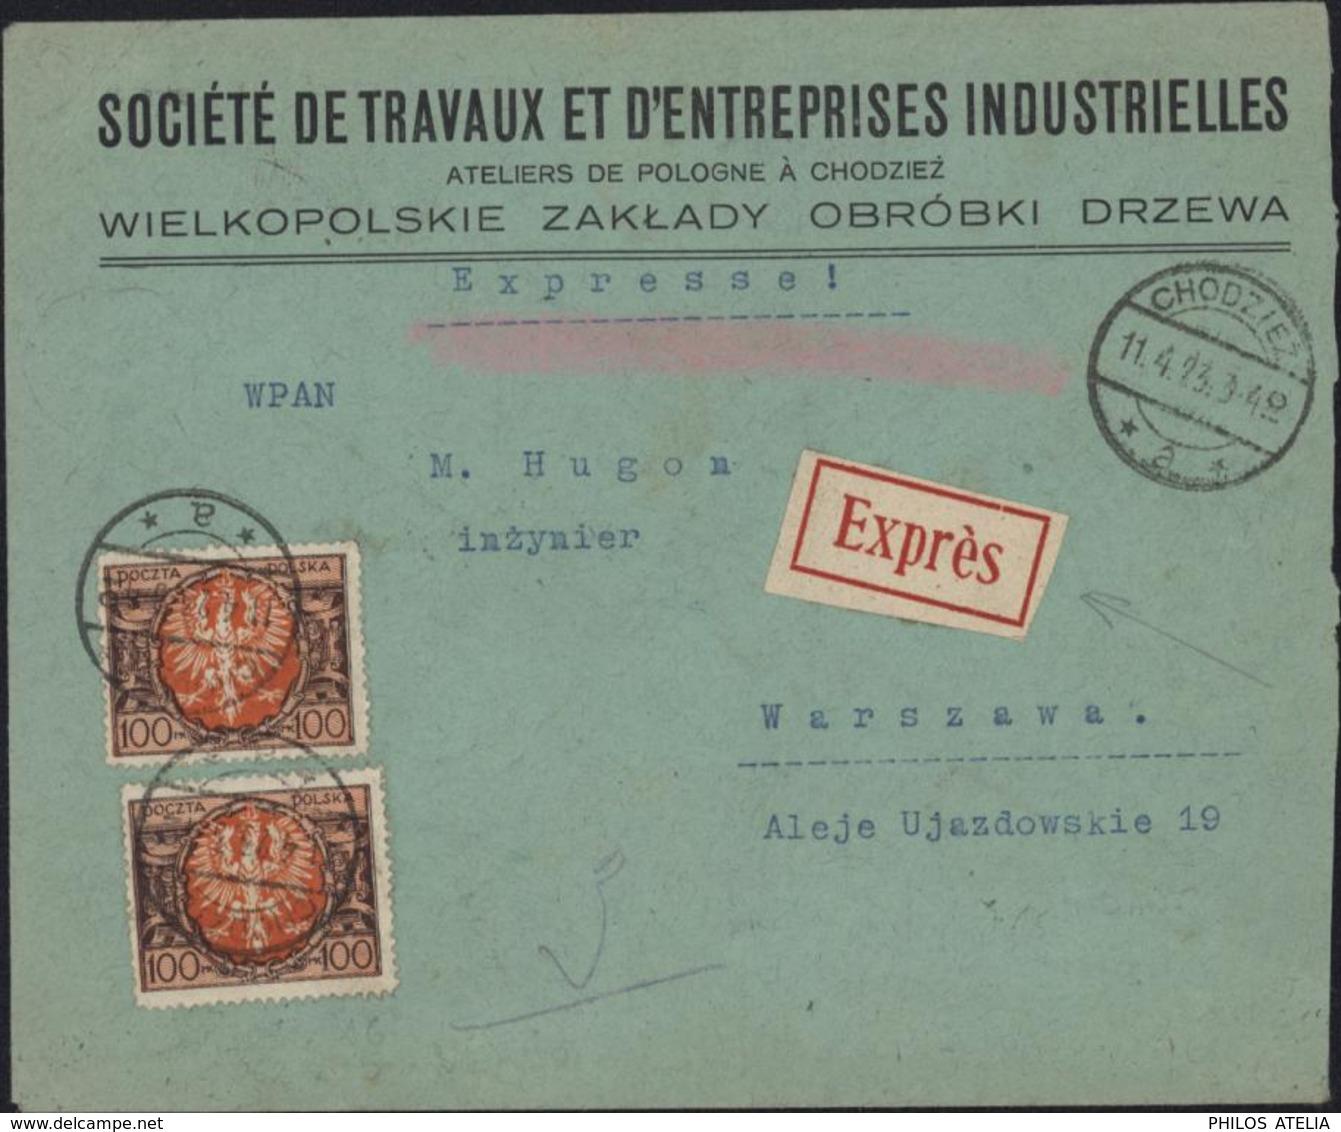 Pologne YT 229 X16 + 262 X5 Poczta Polska Recto Verso Inflation Rare Exprès CAD Chodziez A 11 4 23   3-40 - 1919-1939 Republic